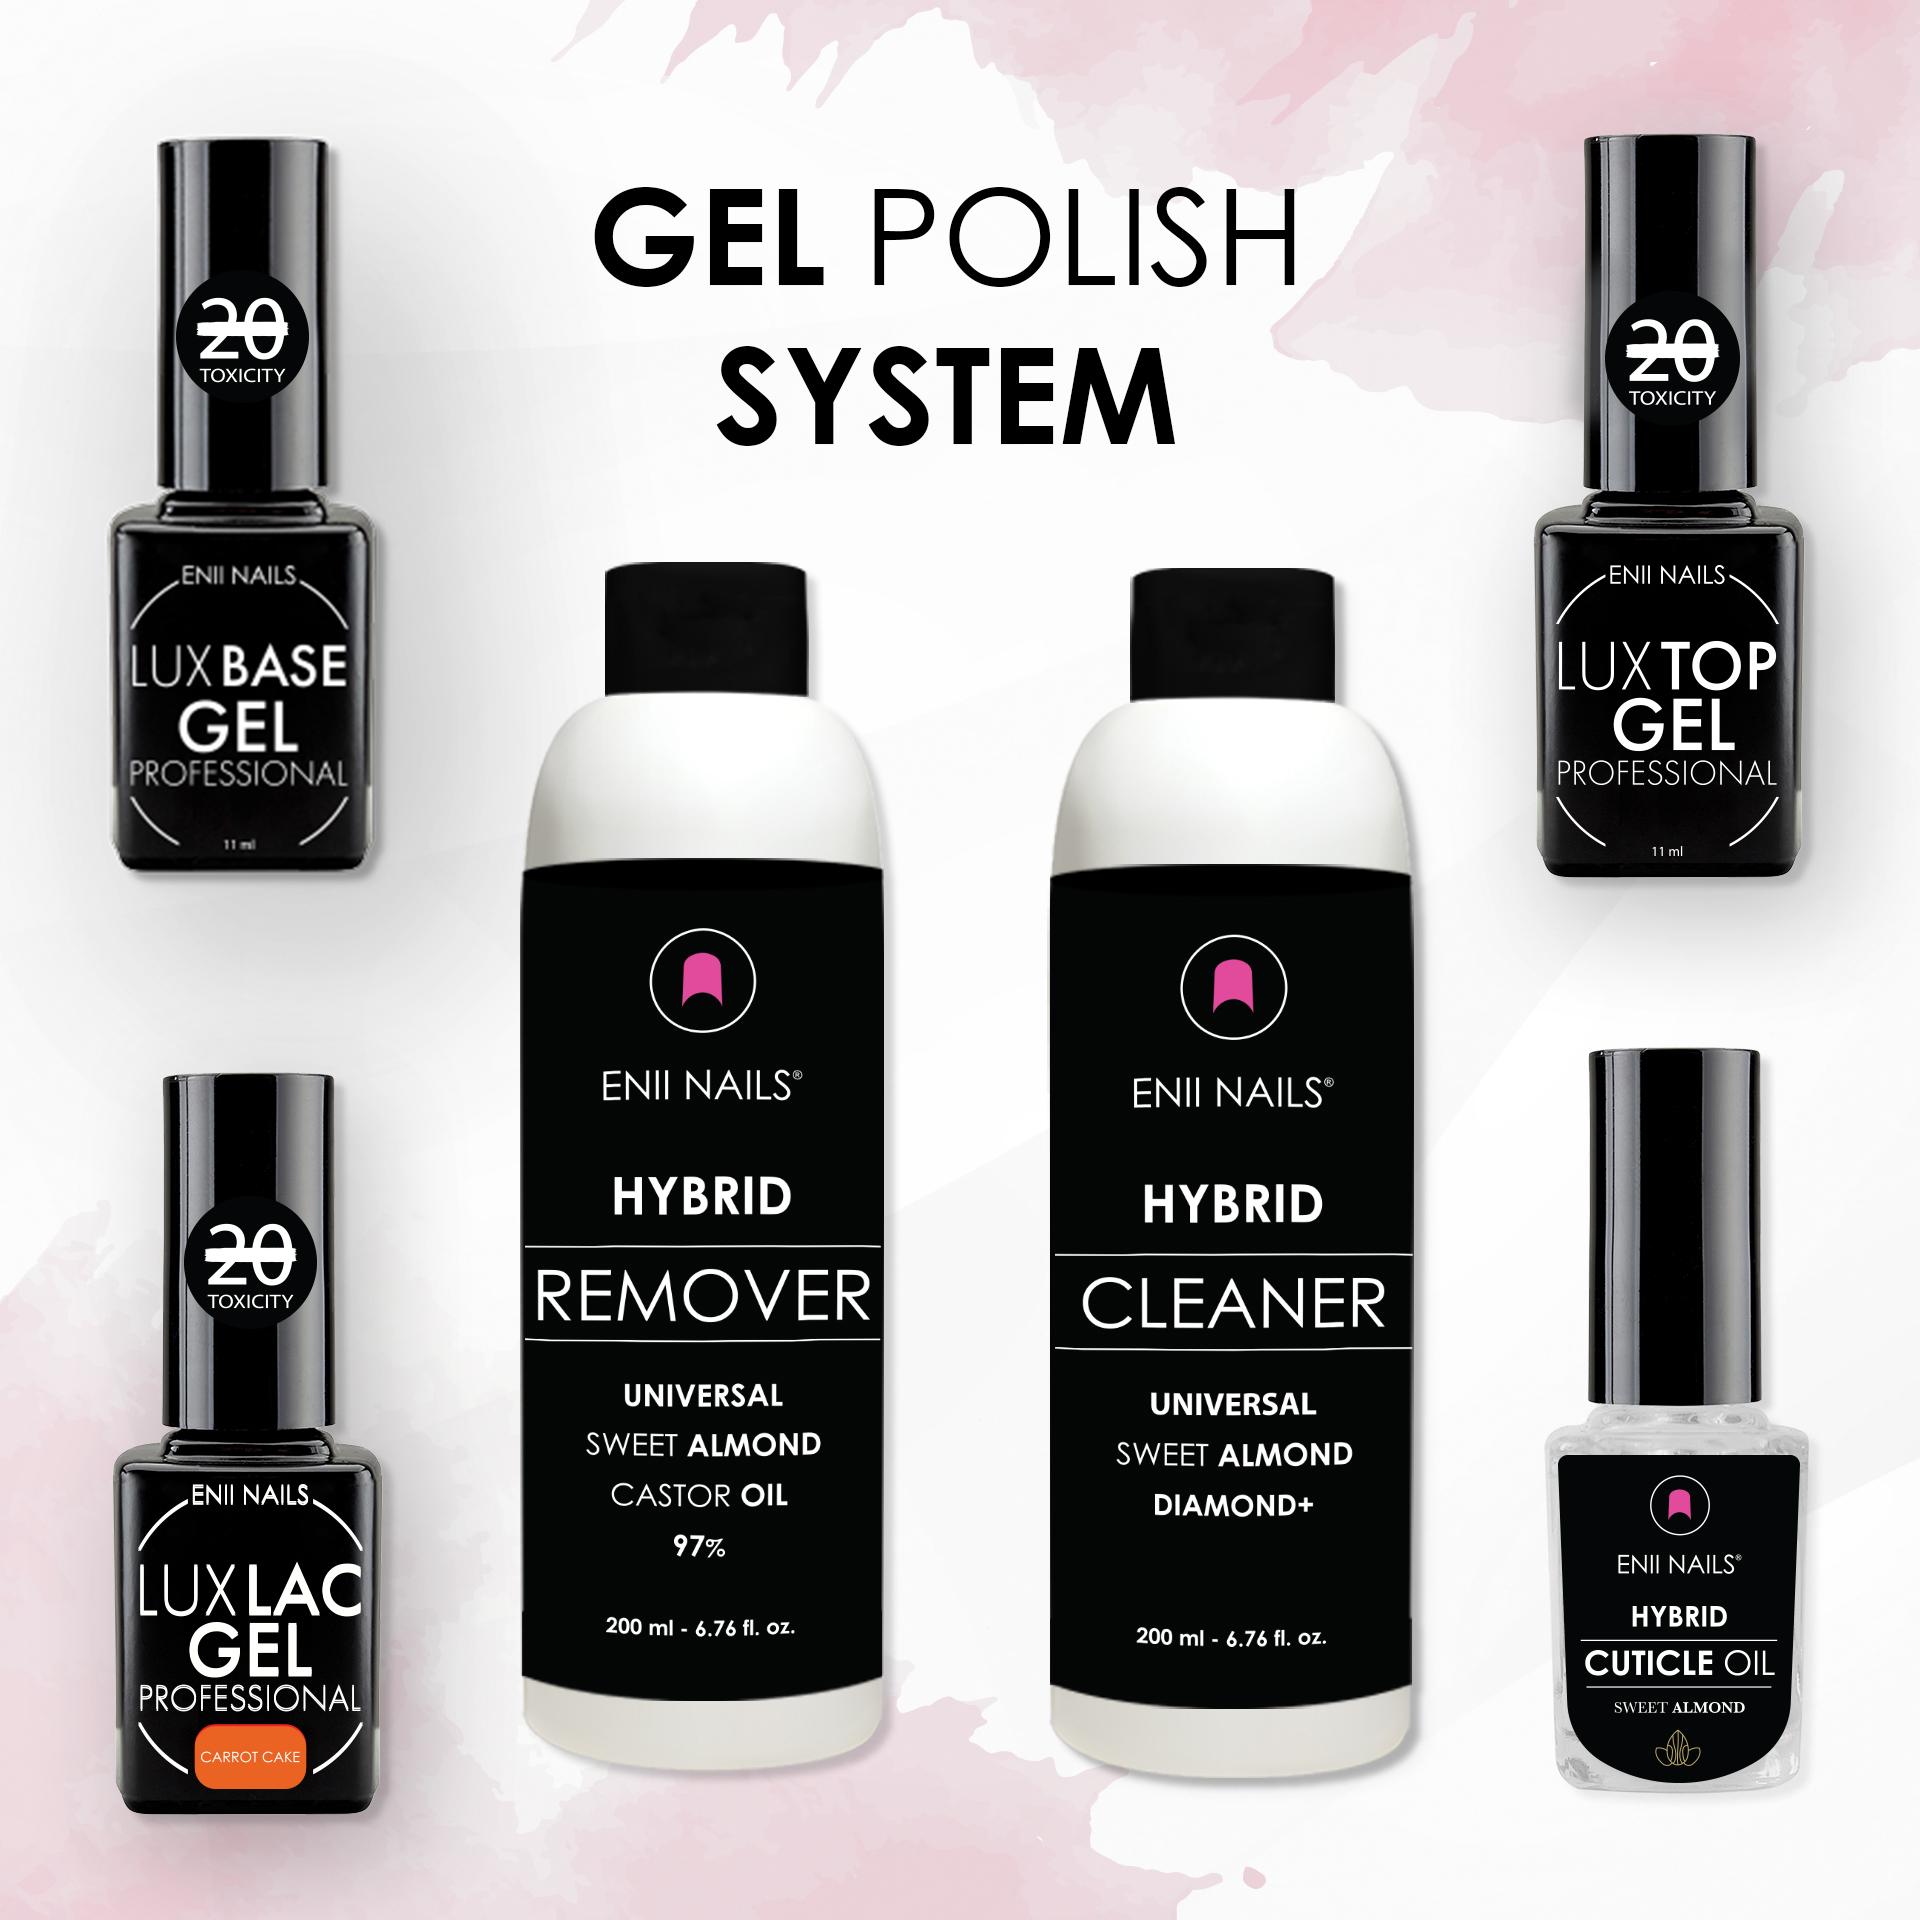 GEL POLISH SYSTEM step by step